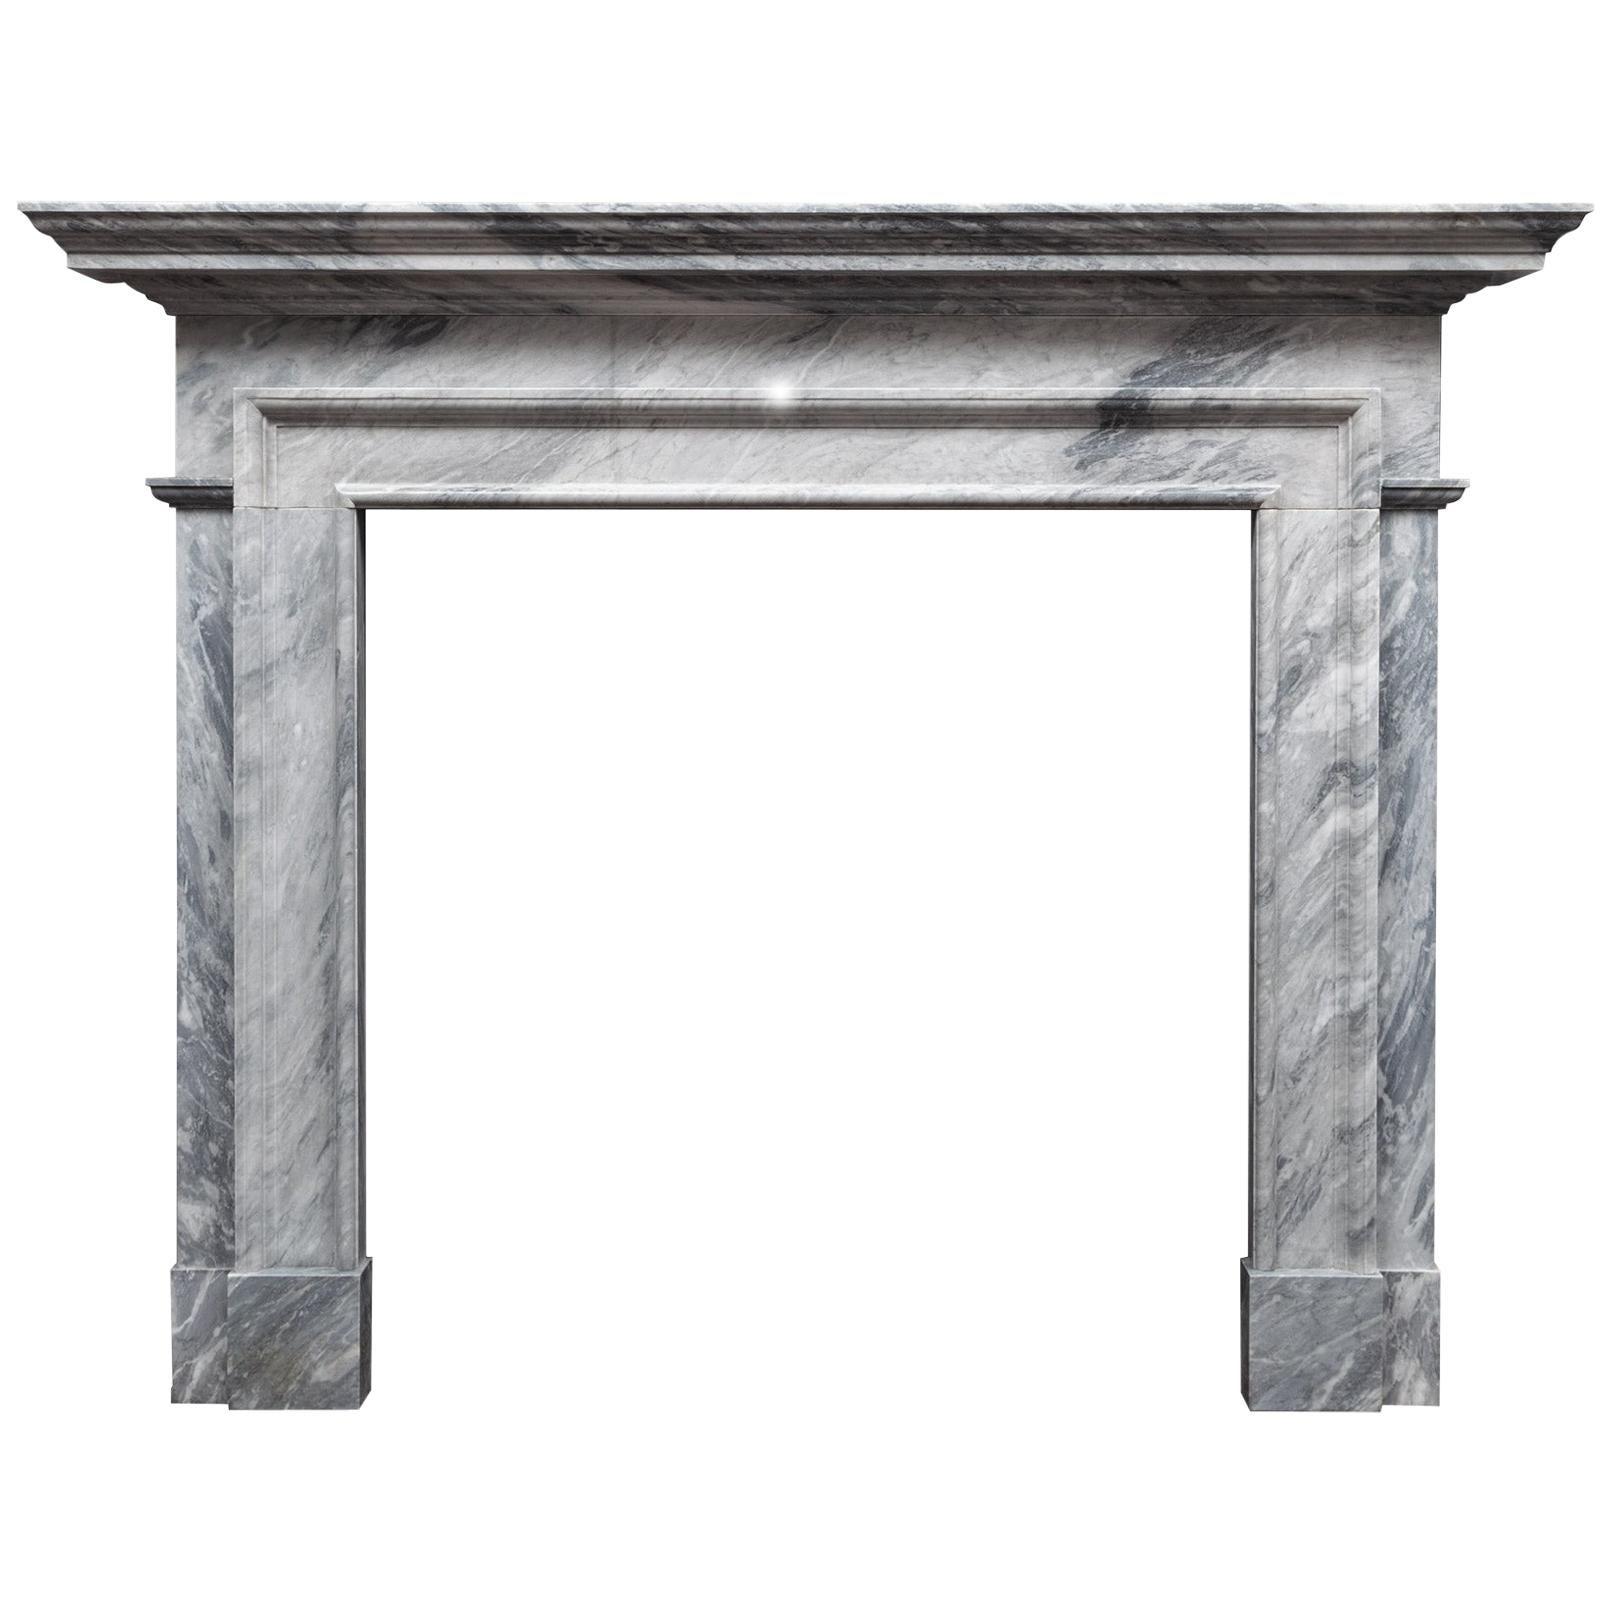 Ryan & Smith Grey Bardiglio Marble Fireplace